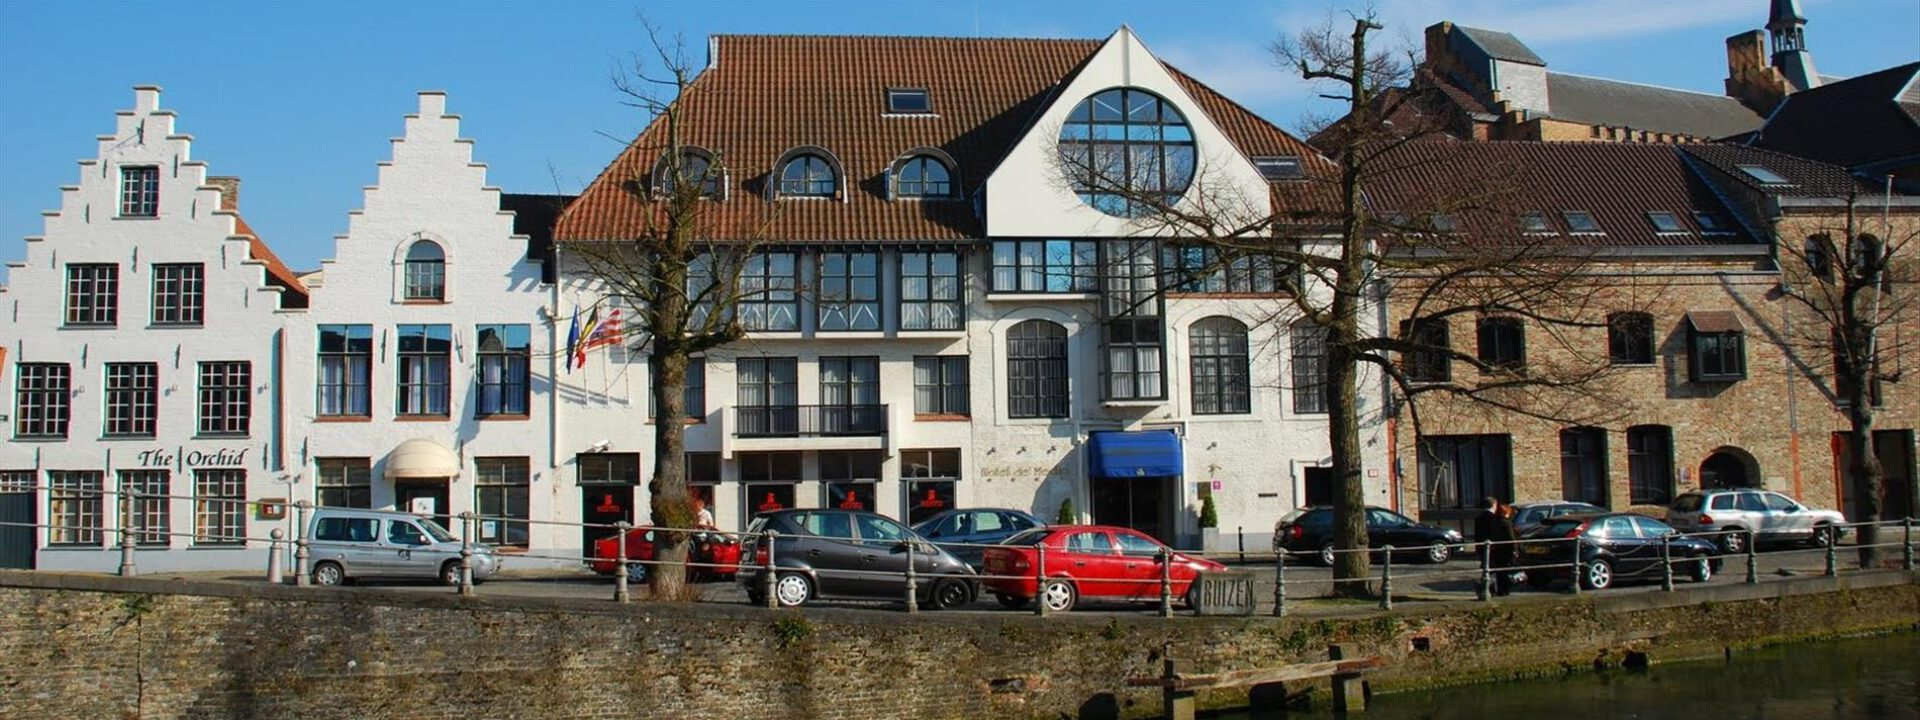 Golden Tulip Hotel De' Medici kiest voor EW Facility Services